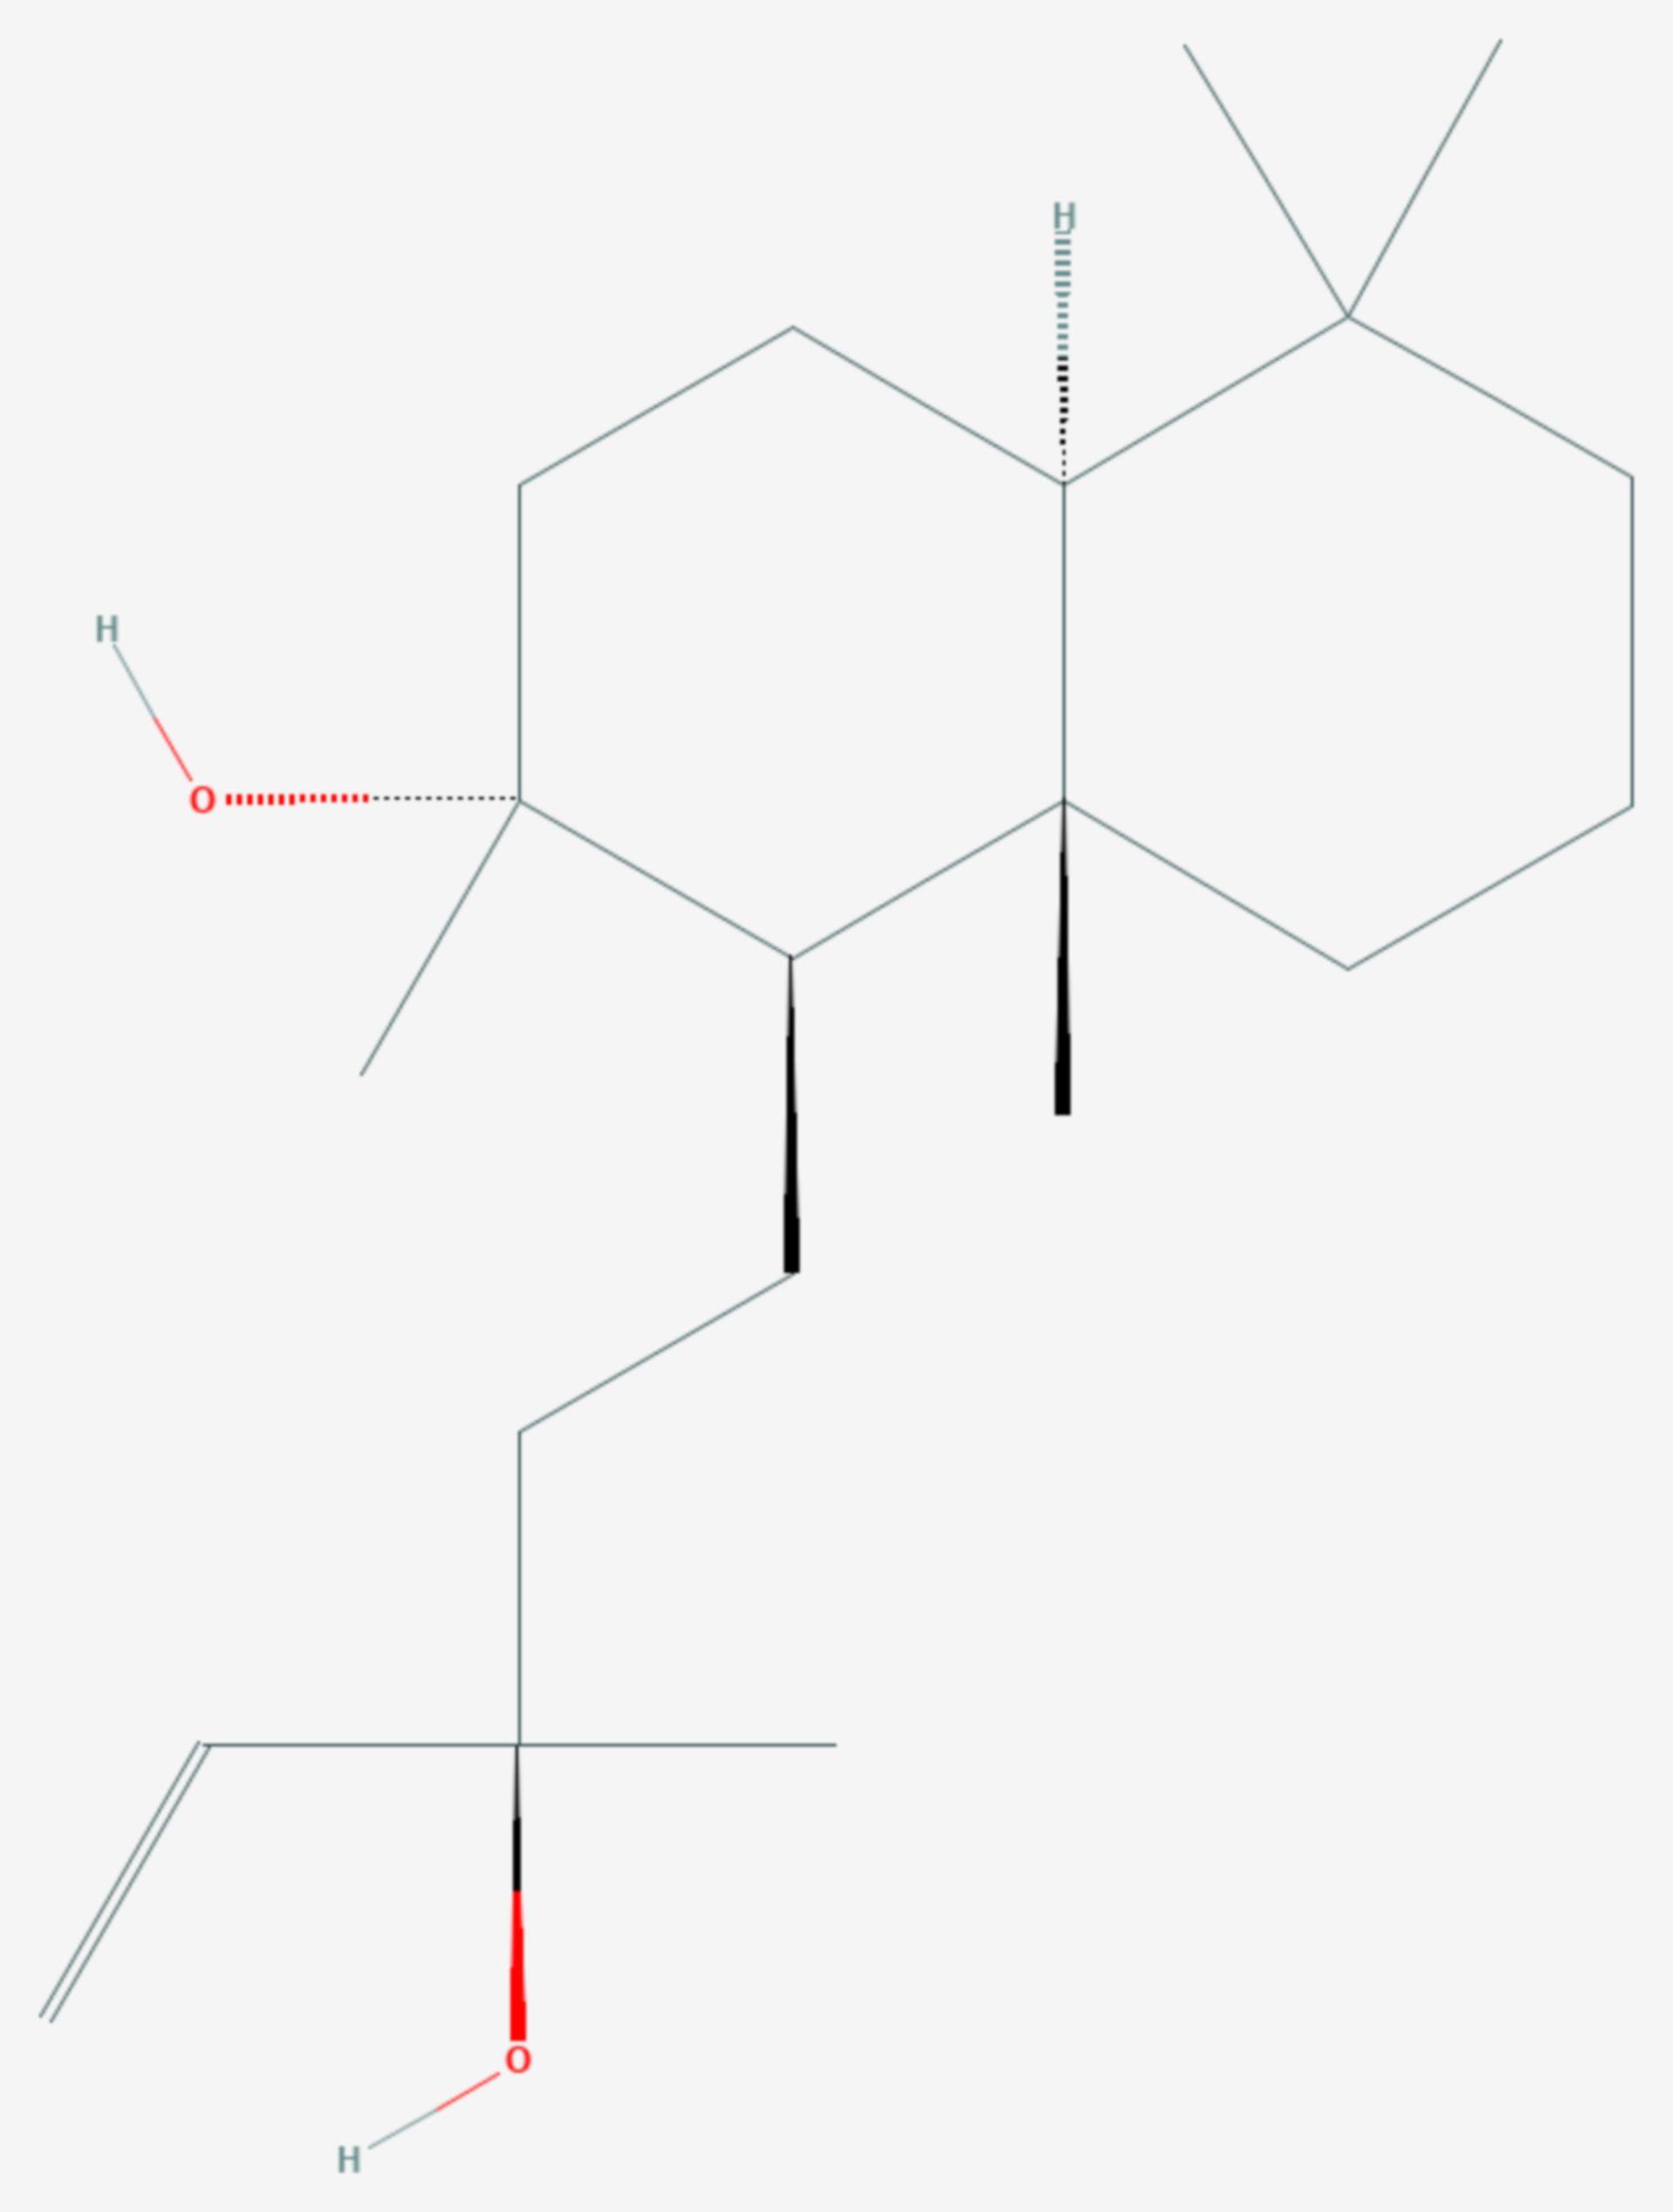 Sclareol (Strukturformel)